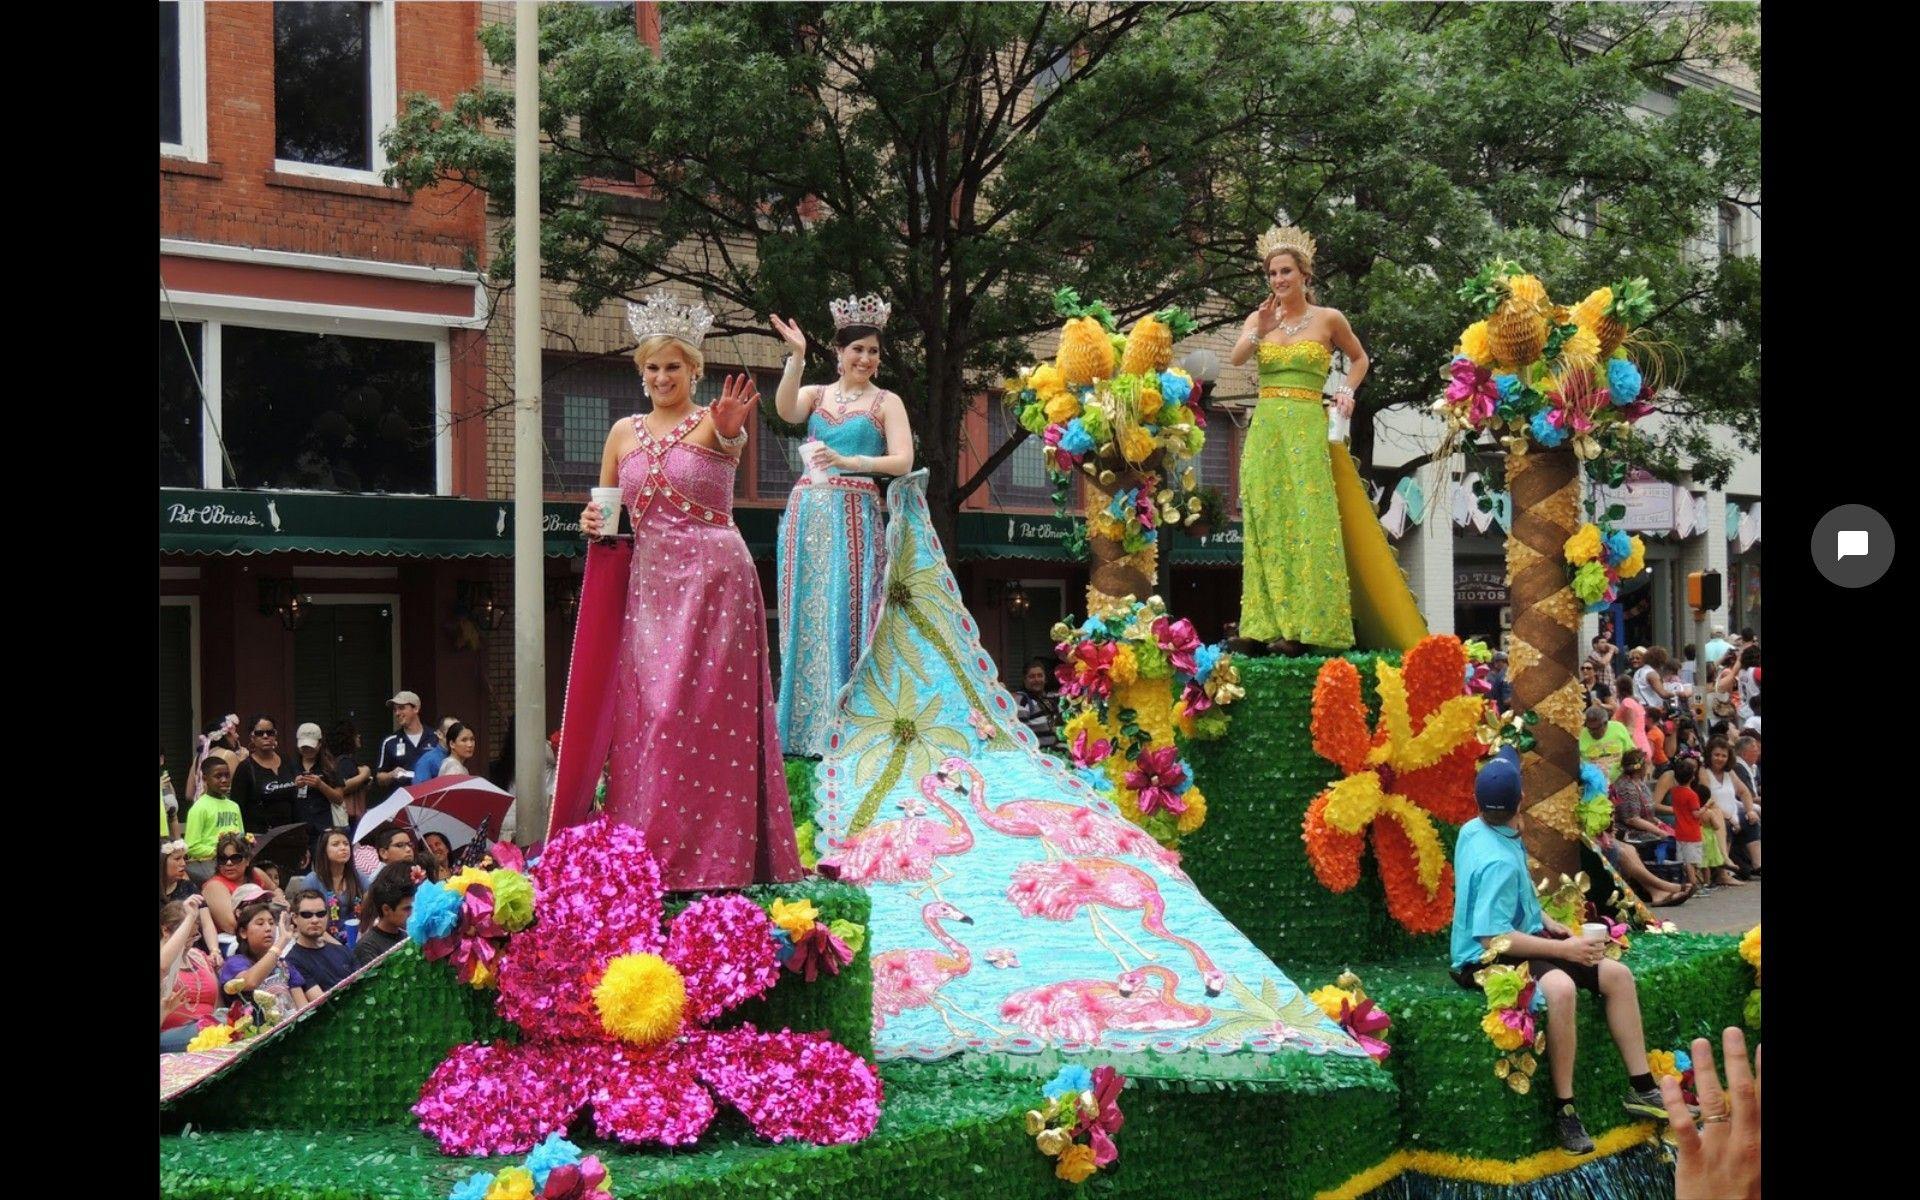 Pin by Karyn O'Brien on Fiesta royal gowns Stylish